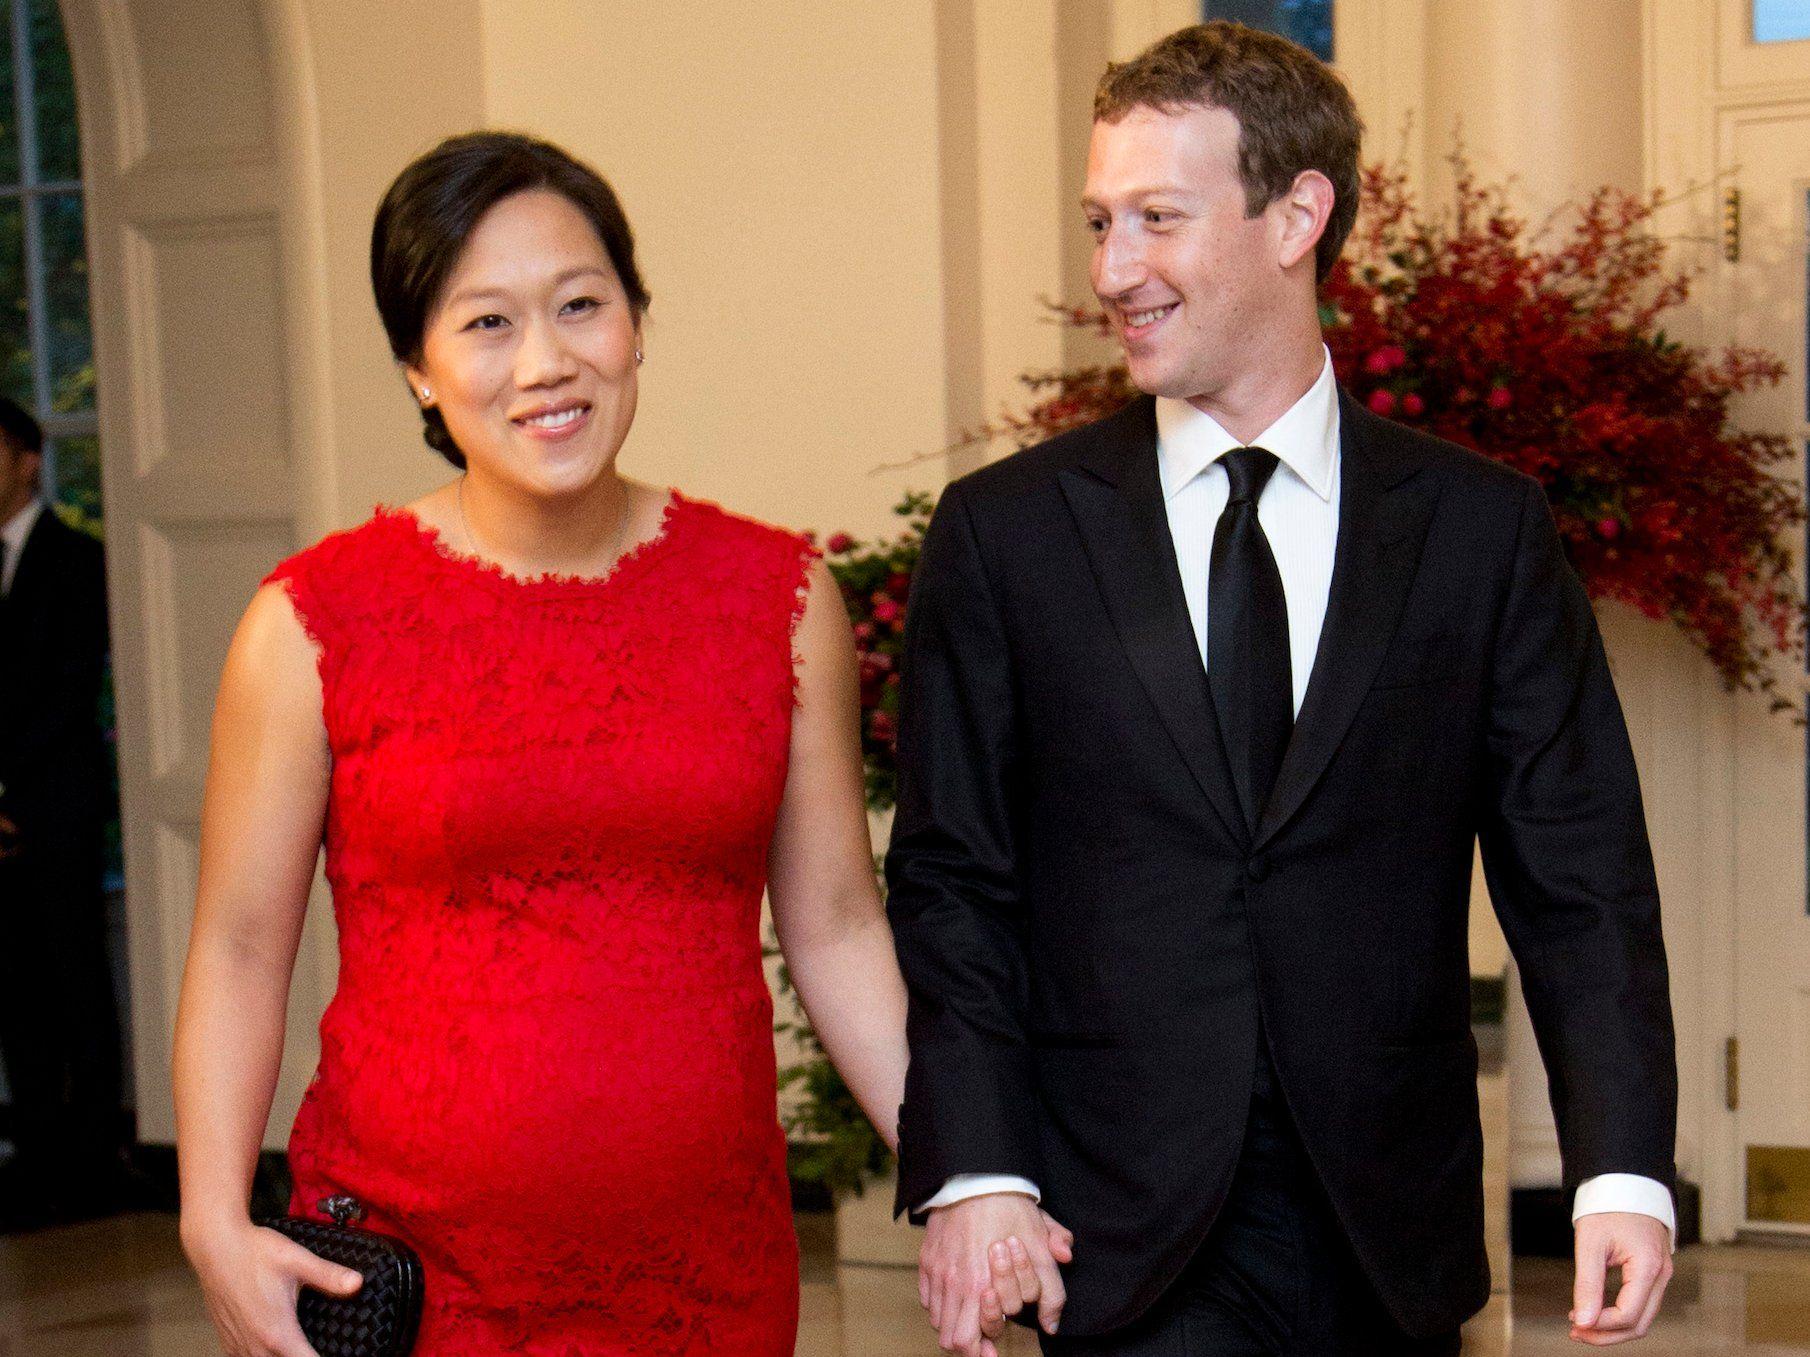 Facebook Ceo Mark Zuckerberg Net Worth And How He Spends His Wealth Mark Zuckerberg House Mark Zuckerberg Zuckerberg